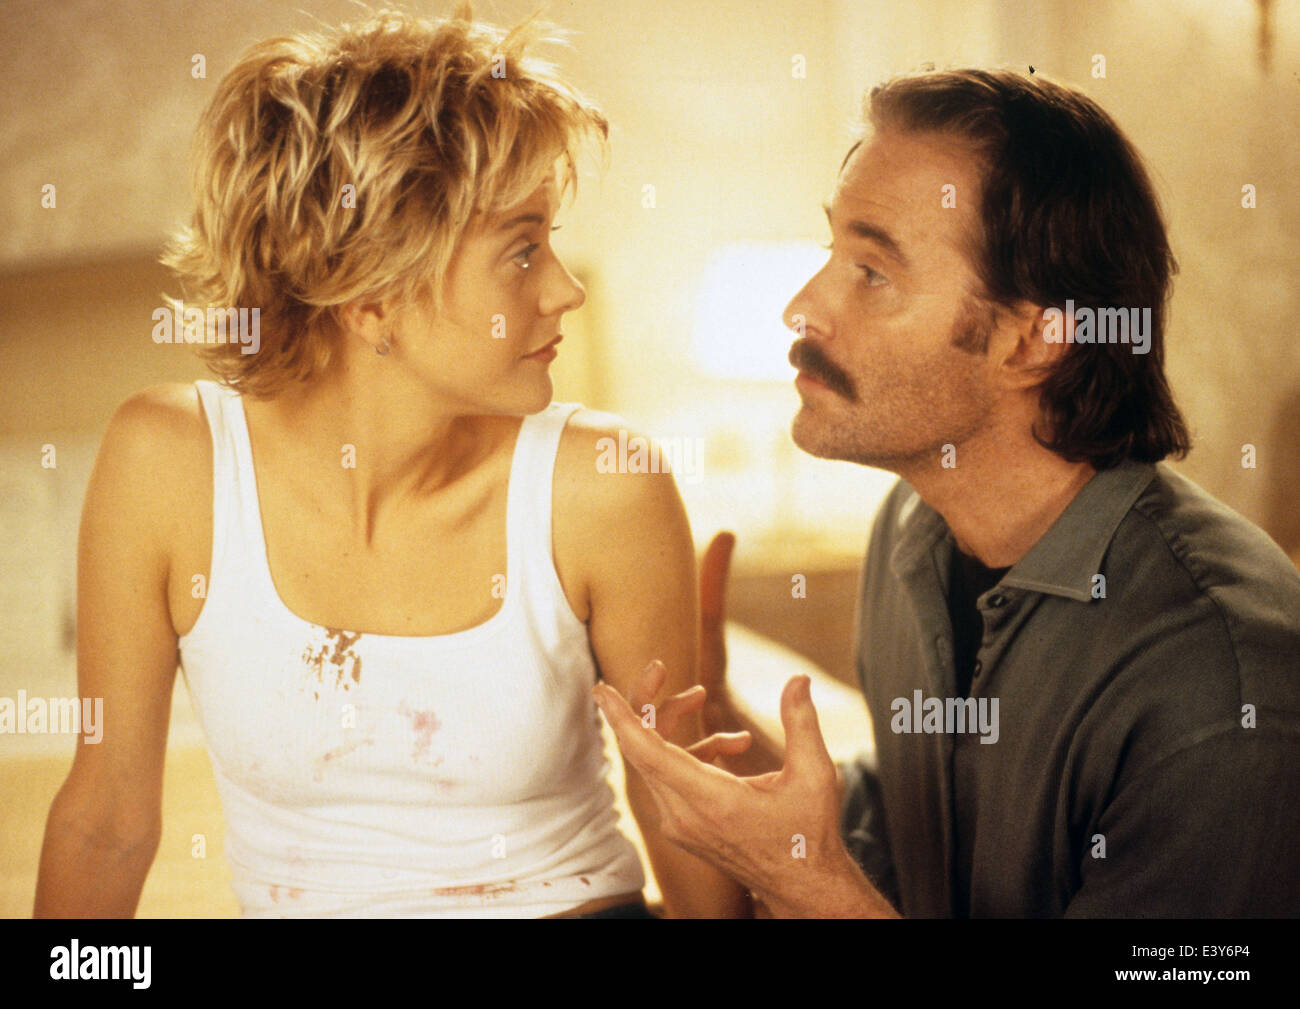 e13525dc9e97 FRENCH KISS 1995 Twentieth Century Fox film with Meg Ryan and Kevin Kline -  Stock Image